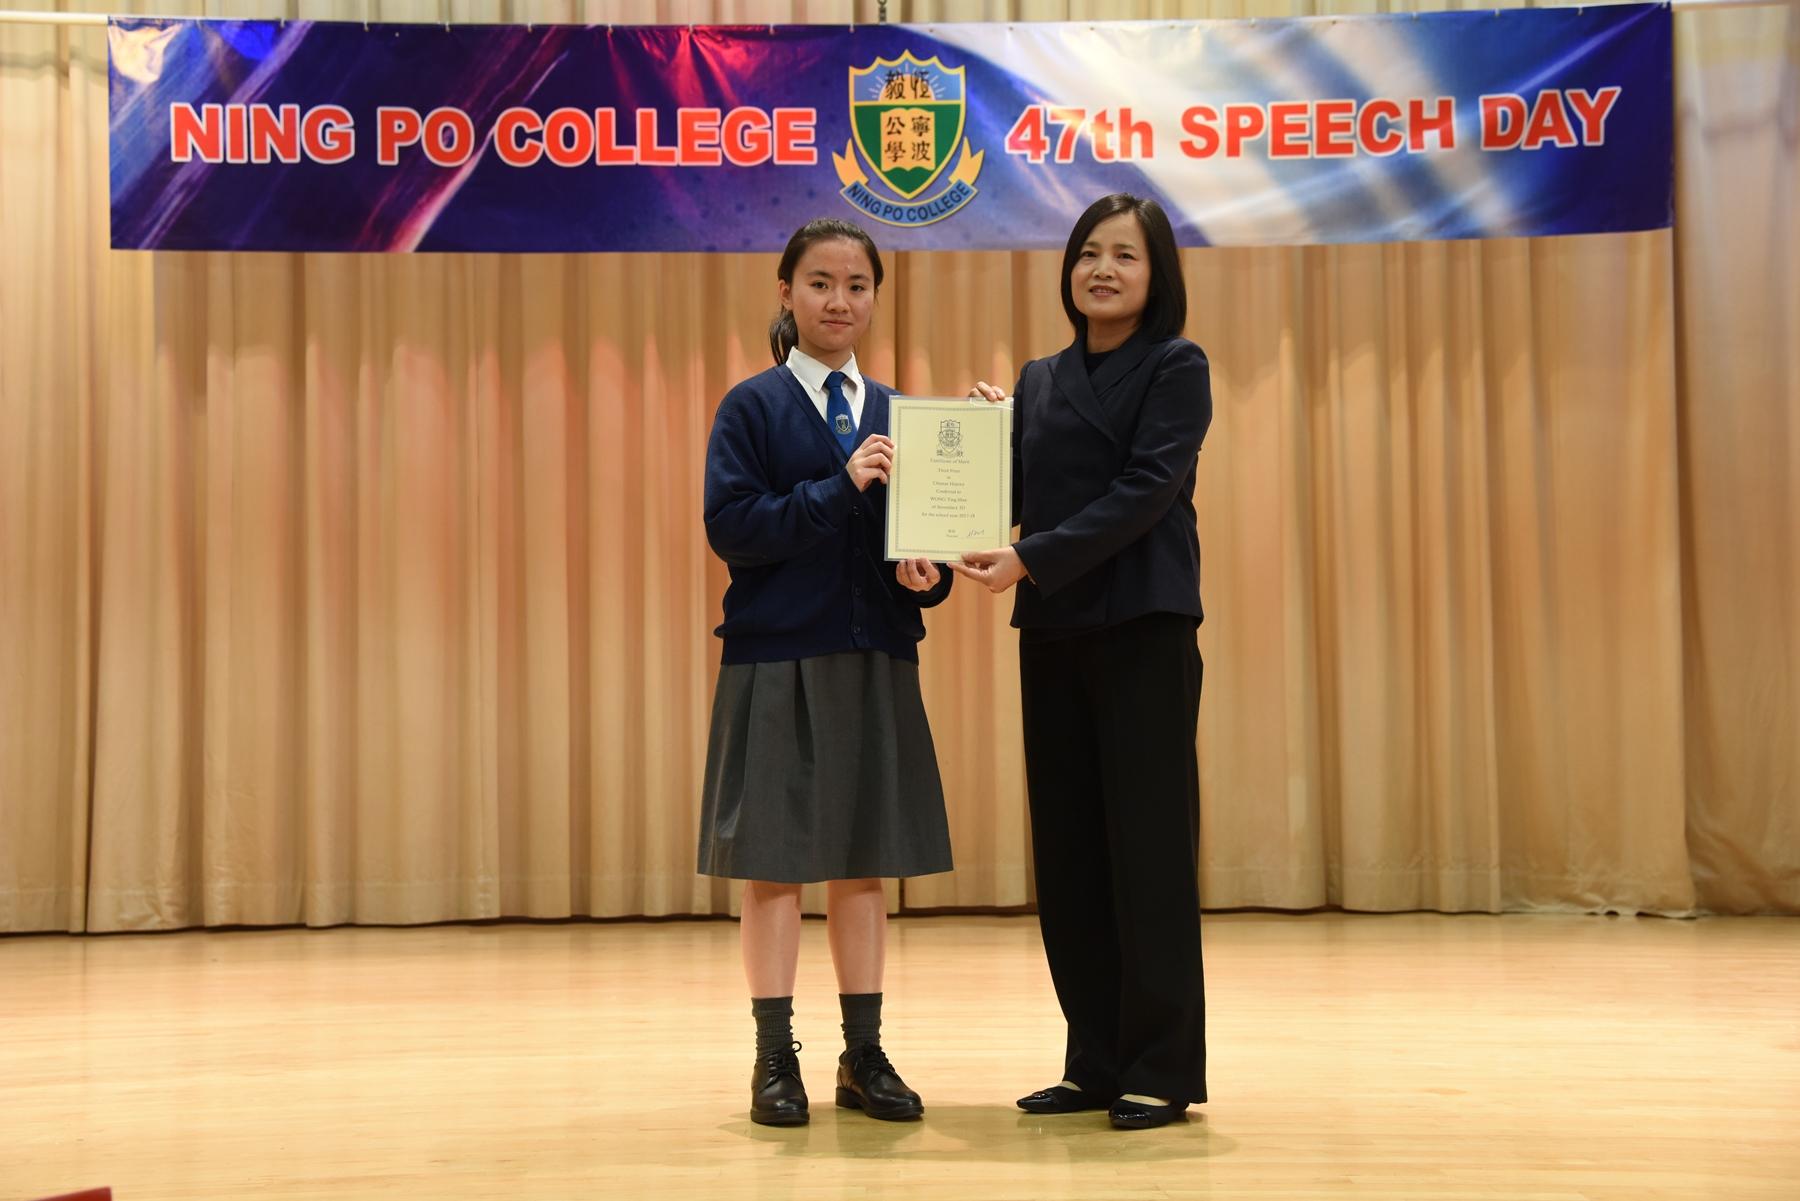 http://npc.edu.hk/sites/default/files/dsc_8640.jpg